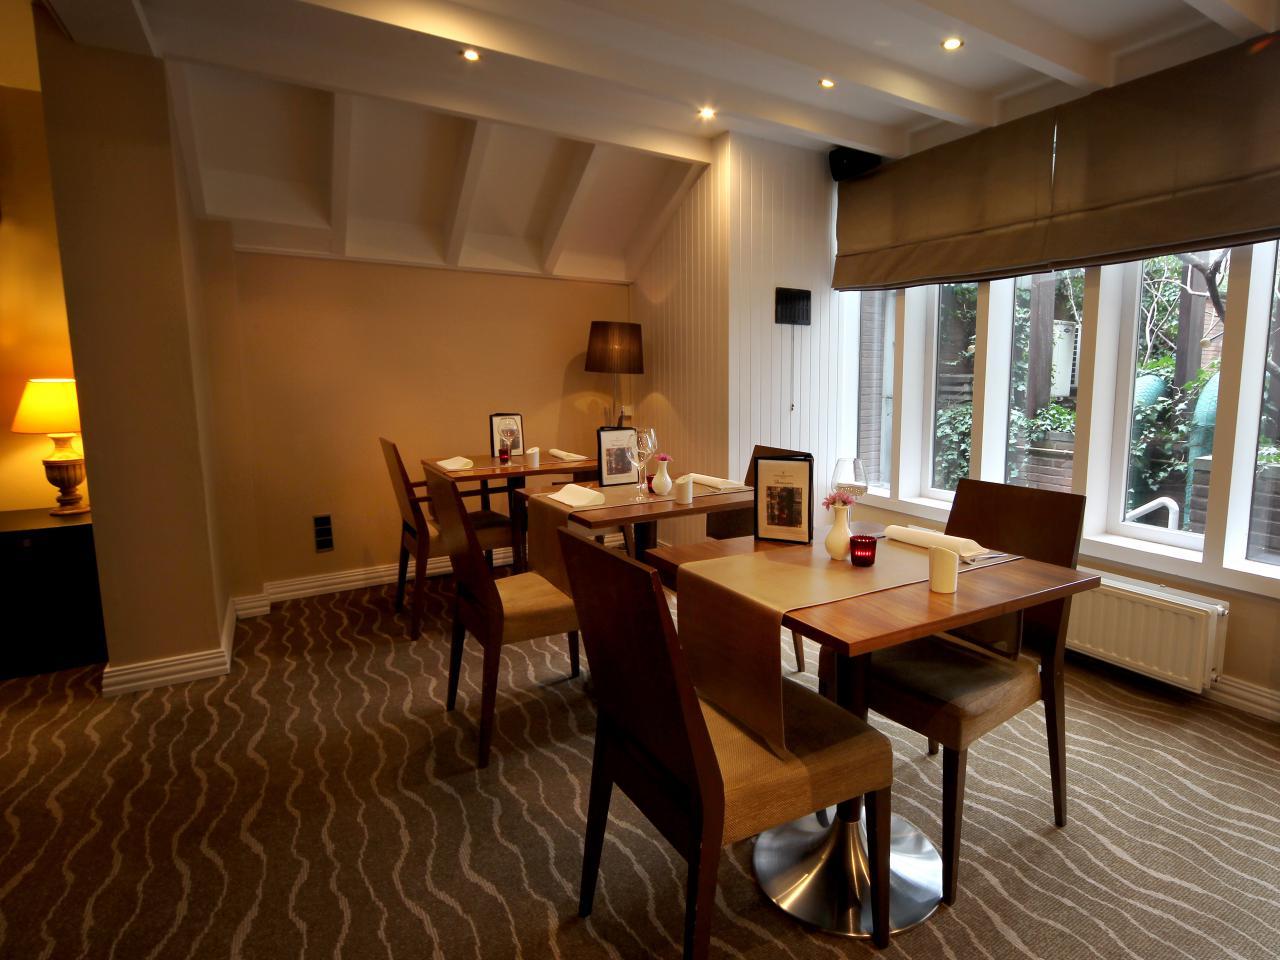 Lounge Bar Photo Gallery | Gresham Belson Hotel In Brussels